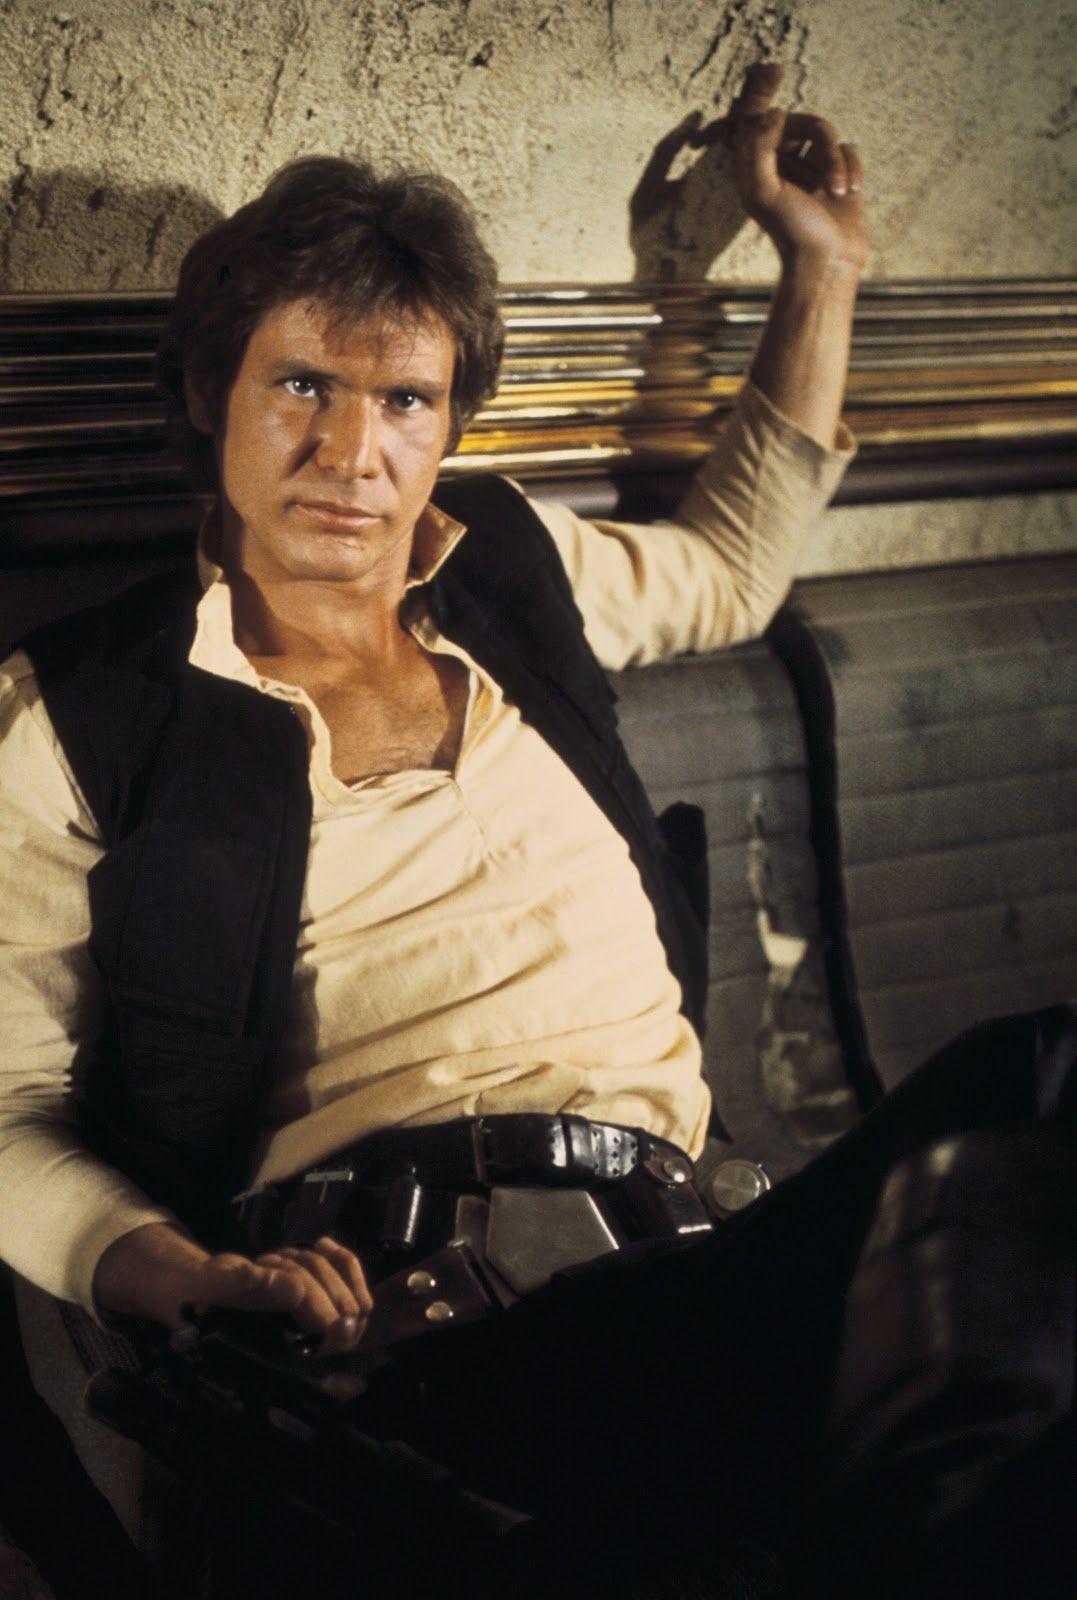 d9282eba3e4c6838292c787489b1db2f 10 Things You Didn't Know About Star Wars: Episode IV - A New Hope